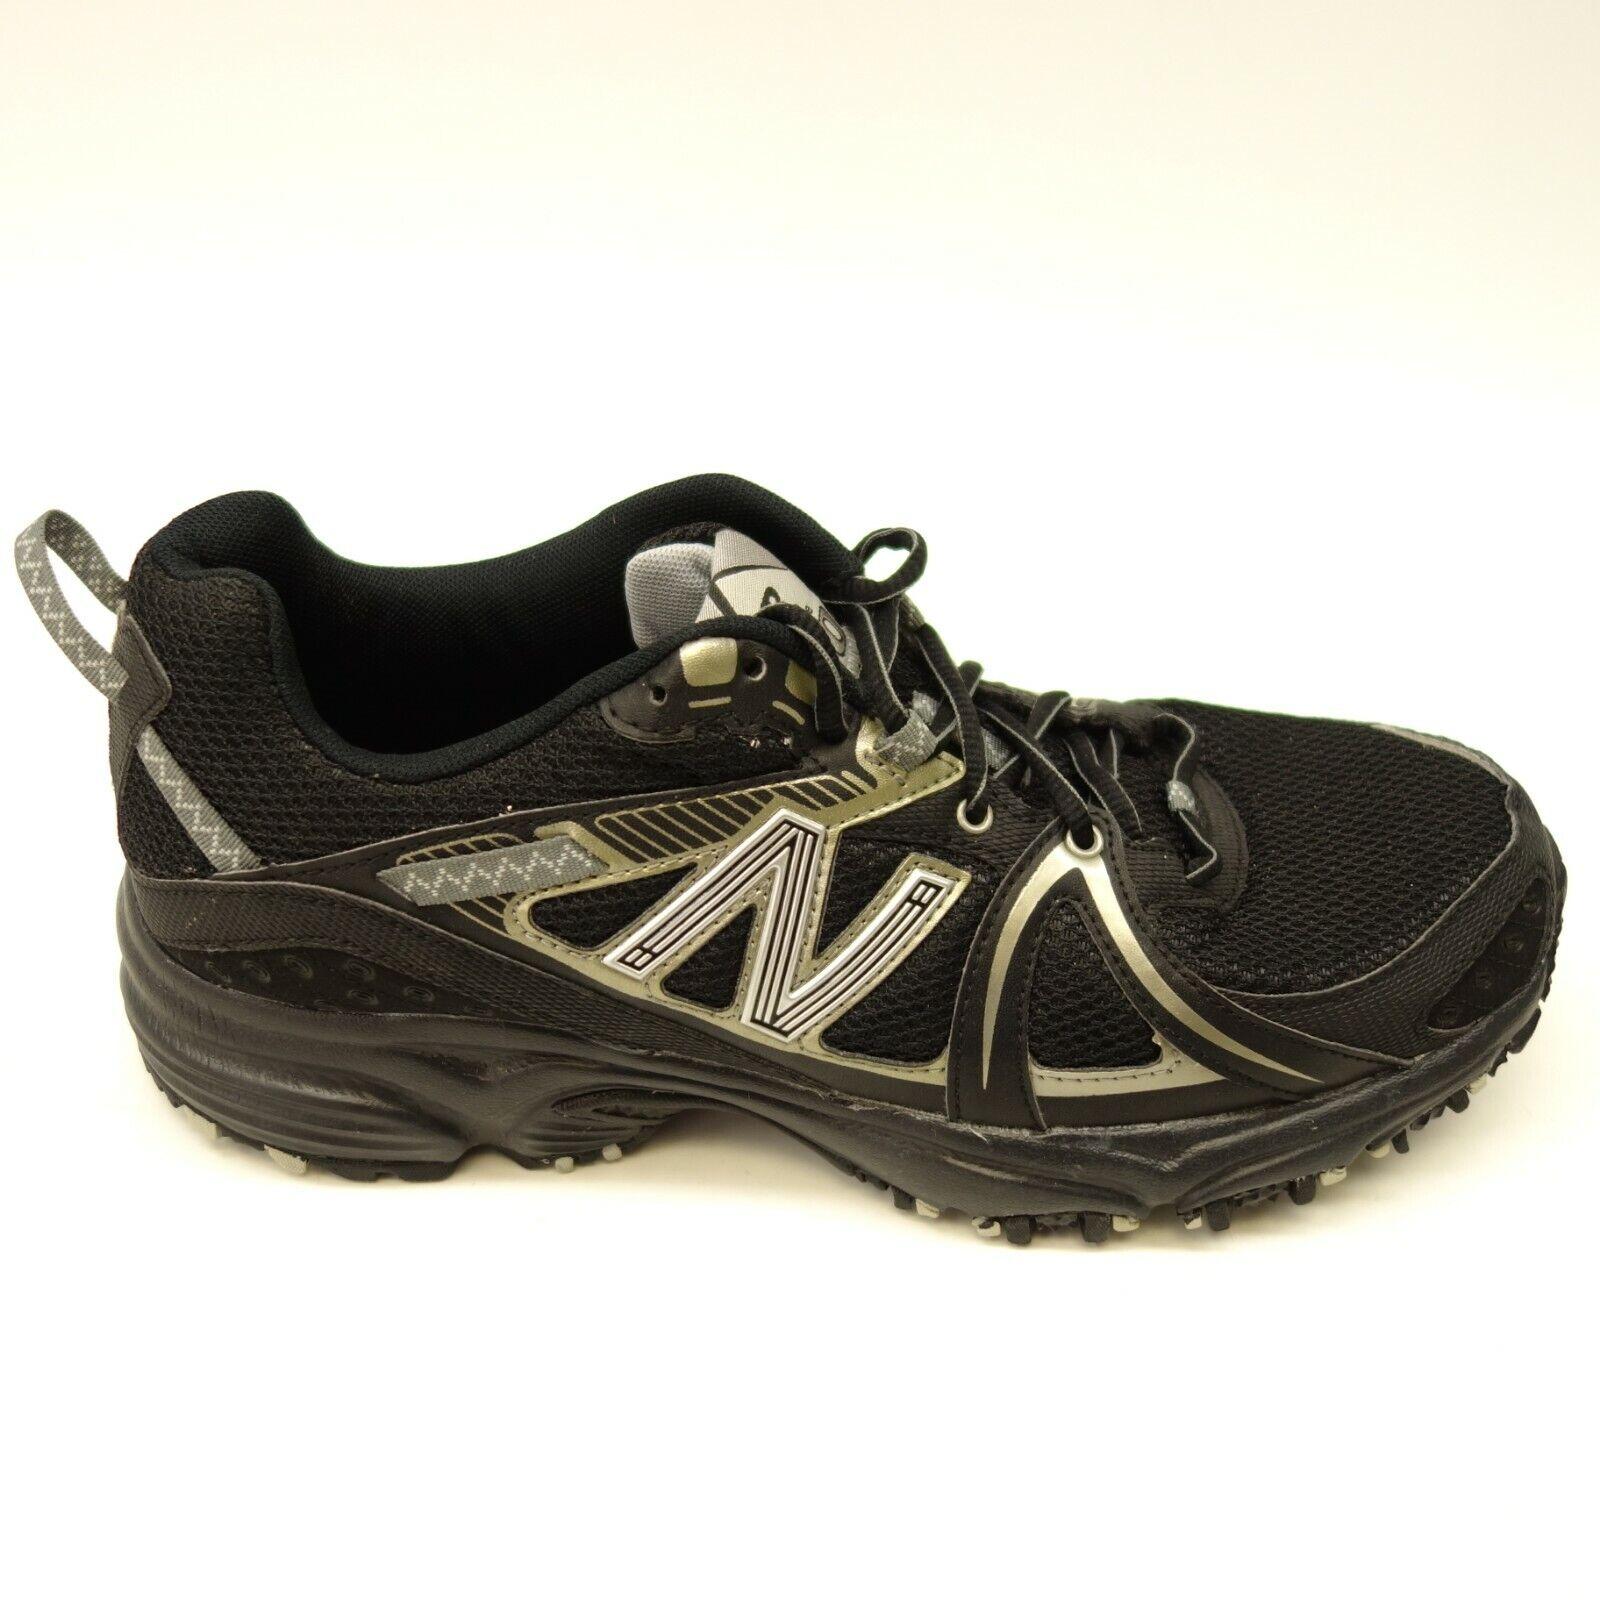 New Balance Herren 510 US 9 Eu 42,5 4E Extra Breite Athletic Health Trail